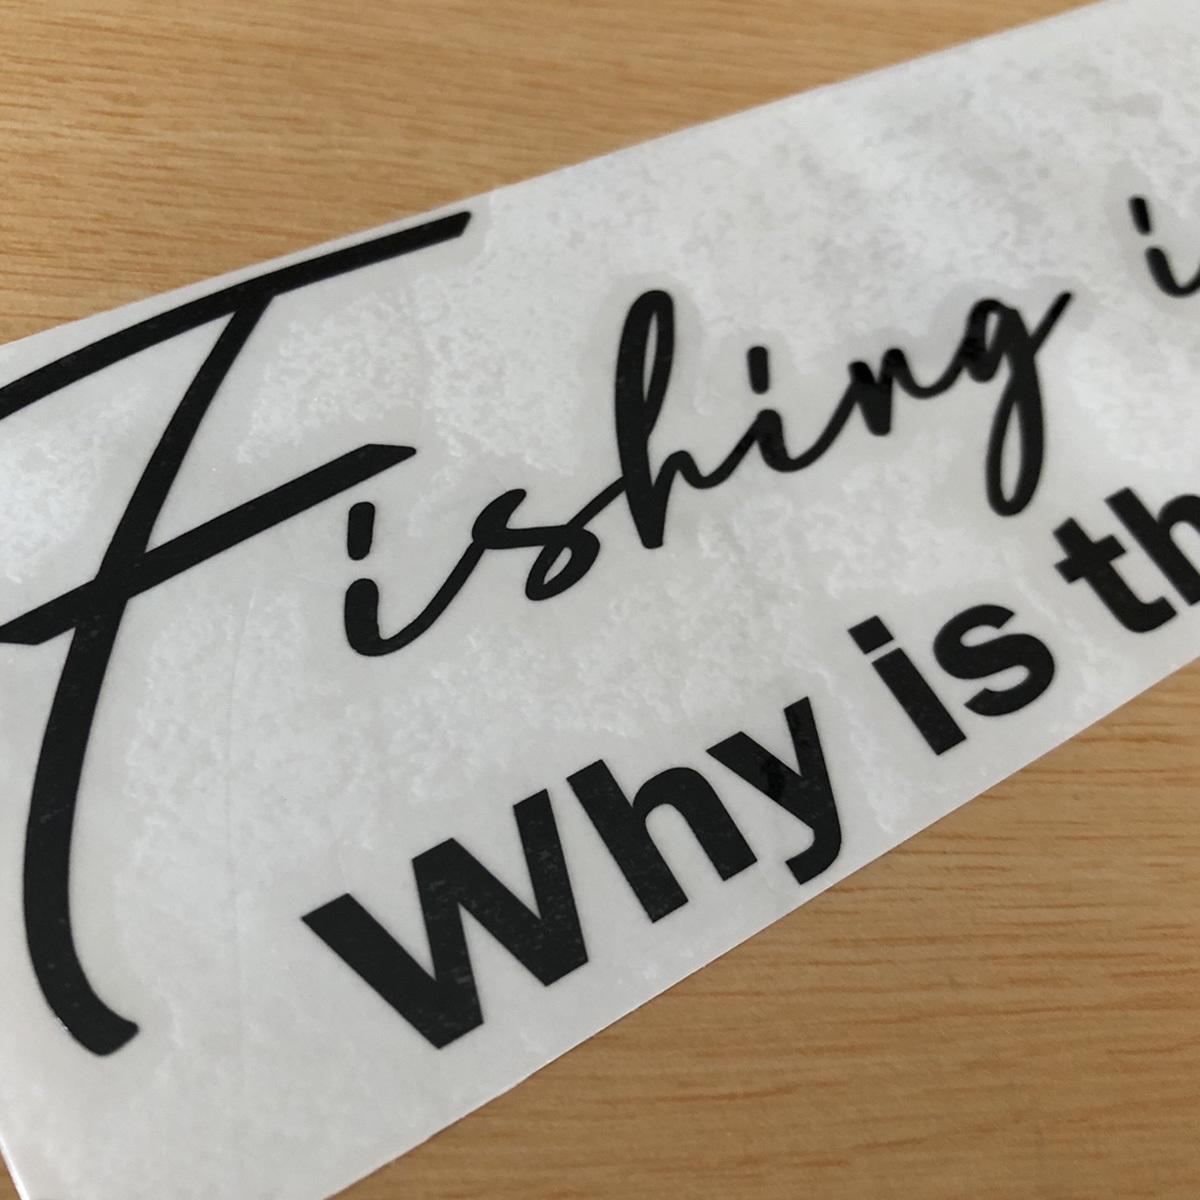 Fishing is my Life!(手書き風文字)カッティングステッカー Why is the fishing so fun?どうして釣りはこんなに楽しいのか?NO519_画像3